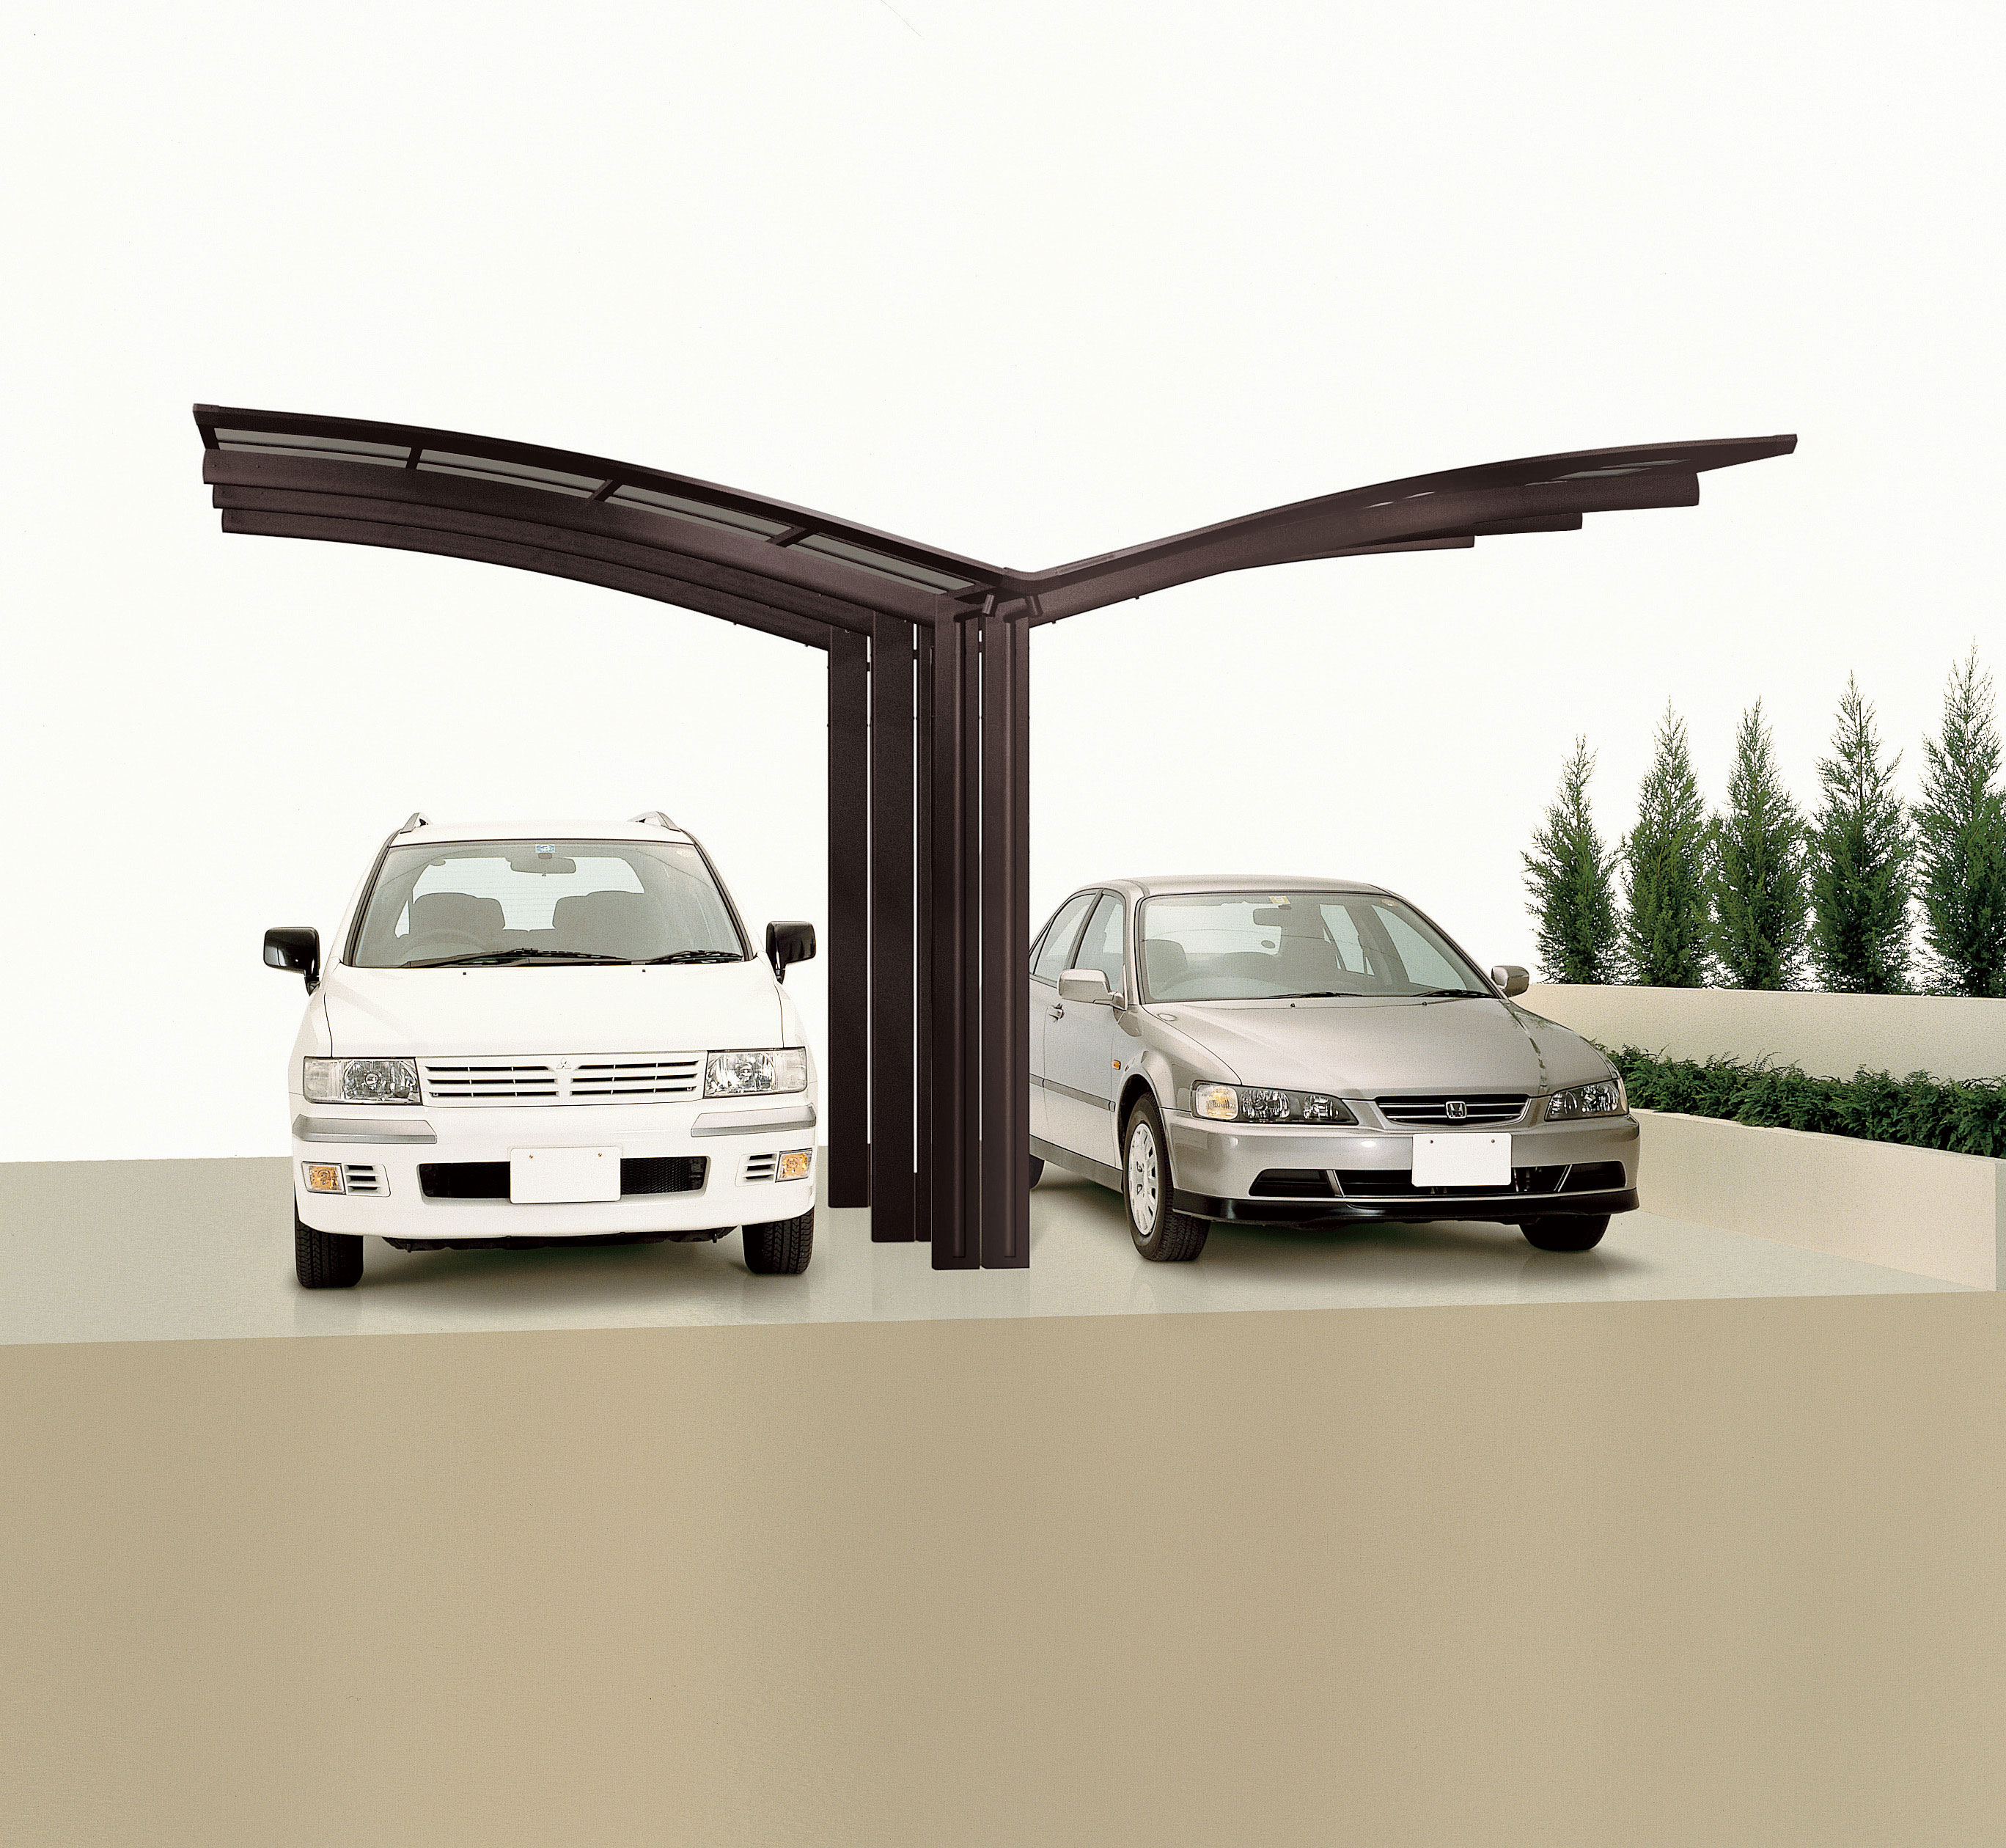 carport ximax portoforte aluminium typ 170 y braun. Black Bedroom Furniture Sets. Home Design Ideas